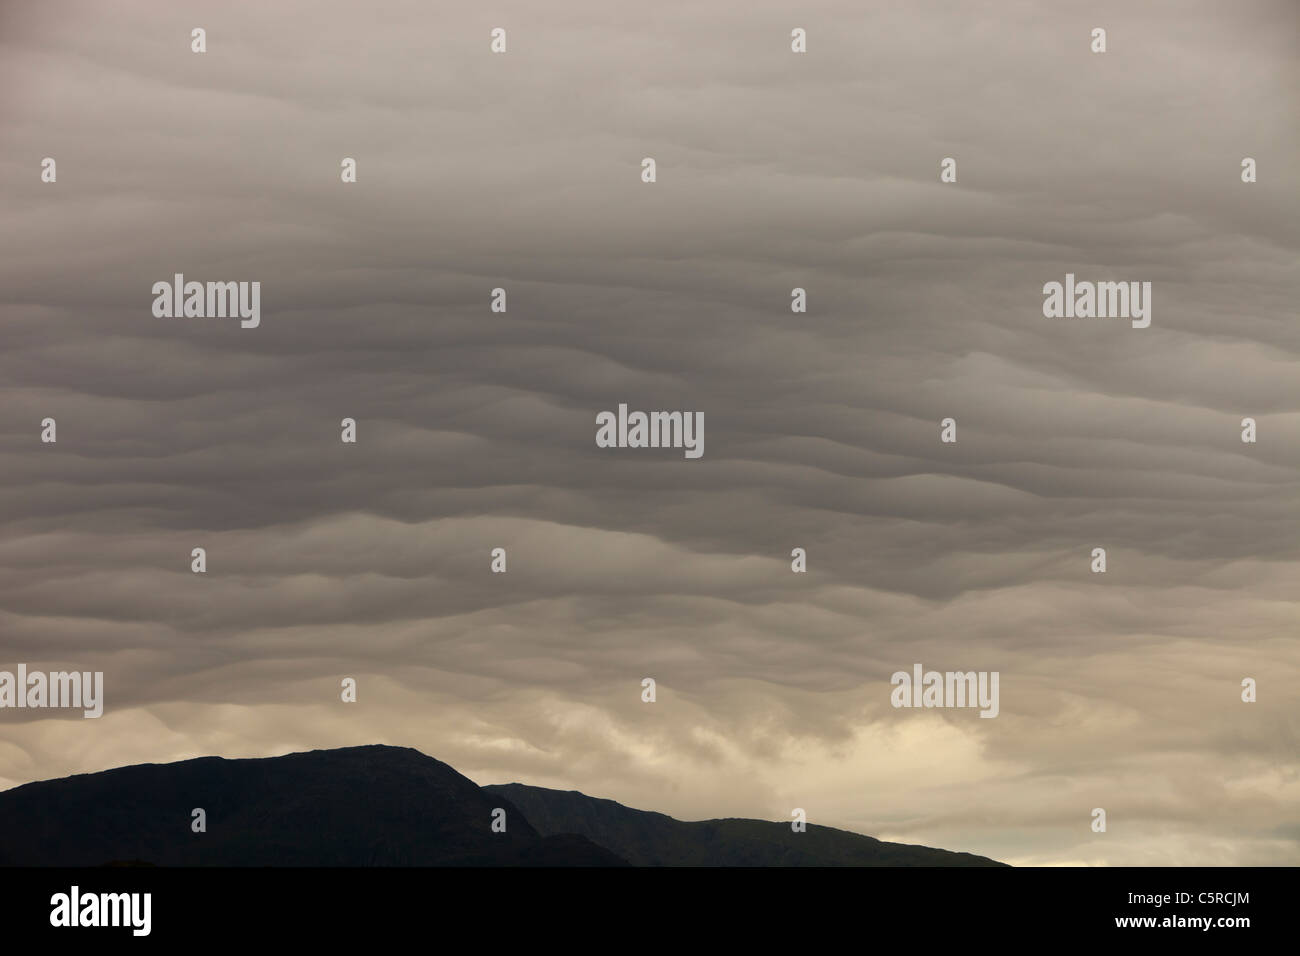 Storm clouds over Ambleside, Cumbria, UK. - Stock Image